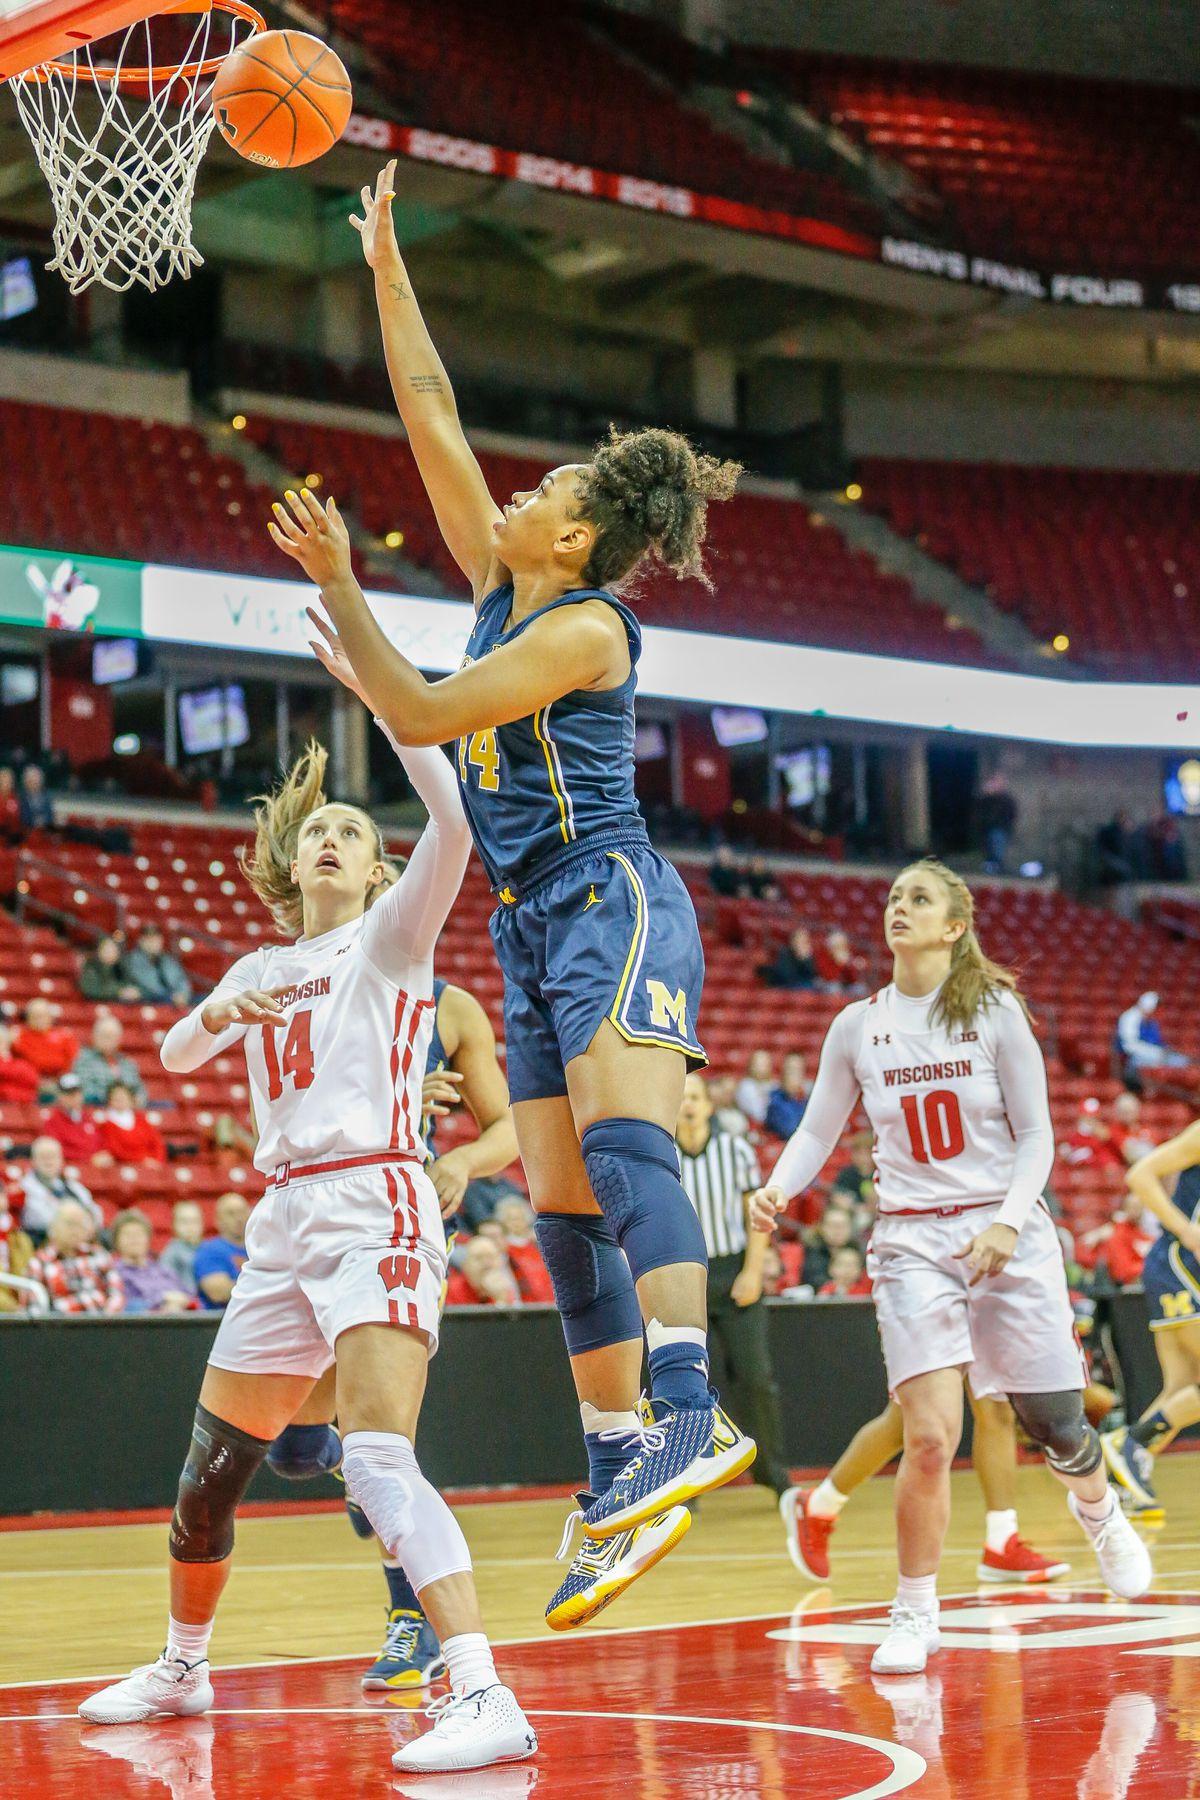 COLLEGE BASKETBALL: JAN 16 Women's Michigan at Wisconsin